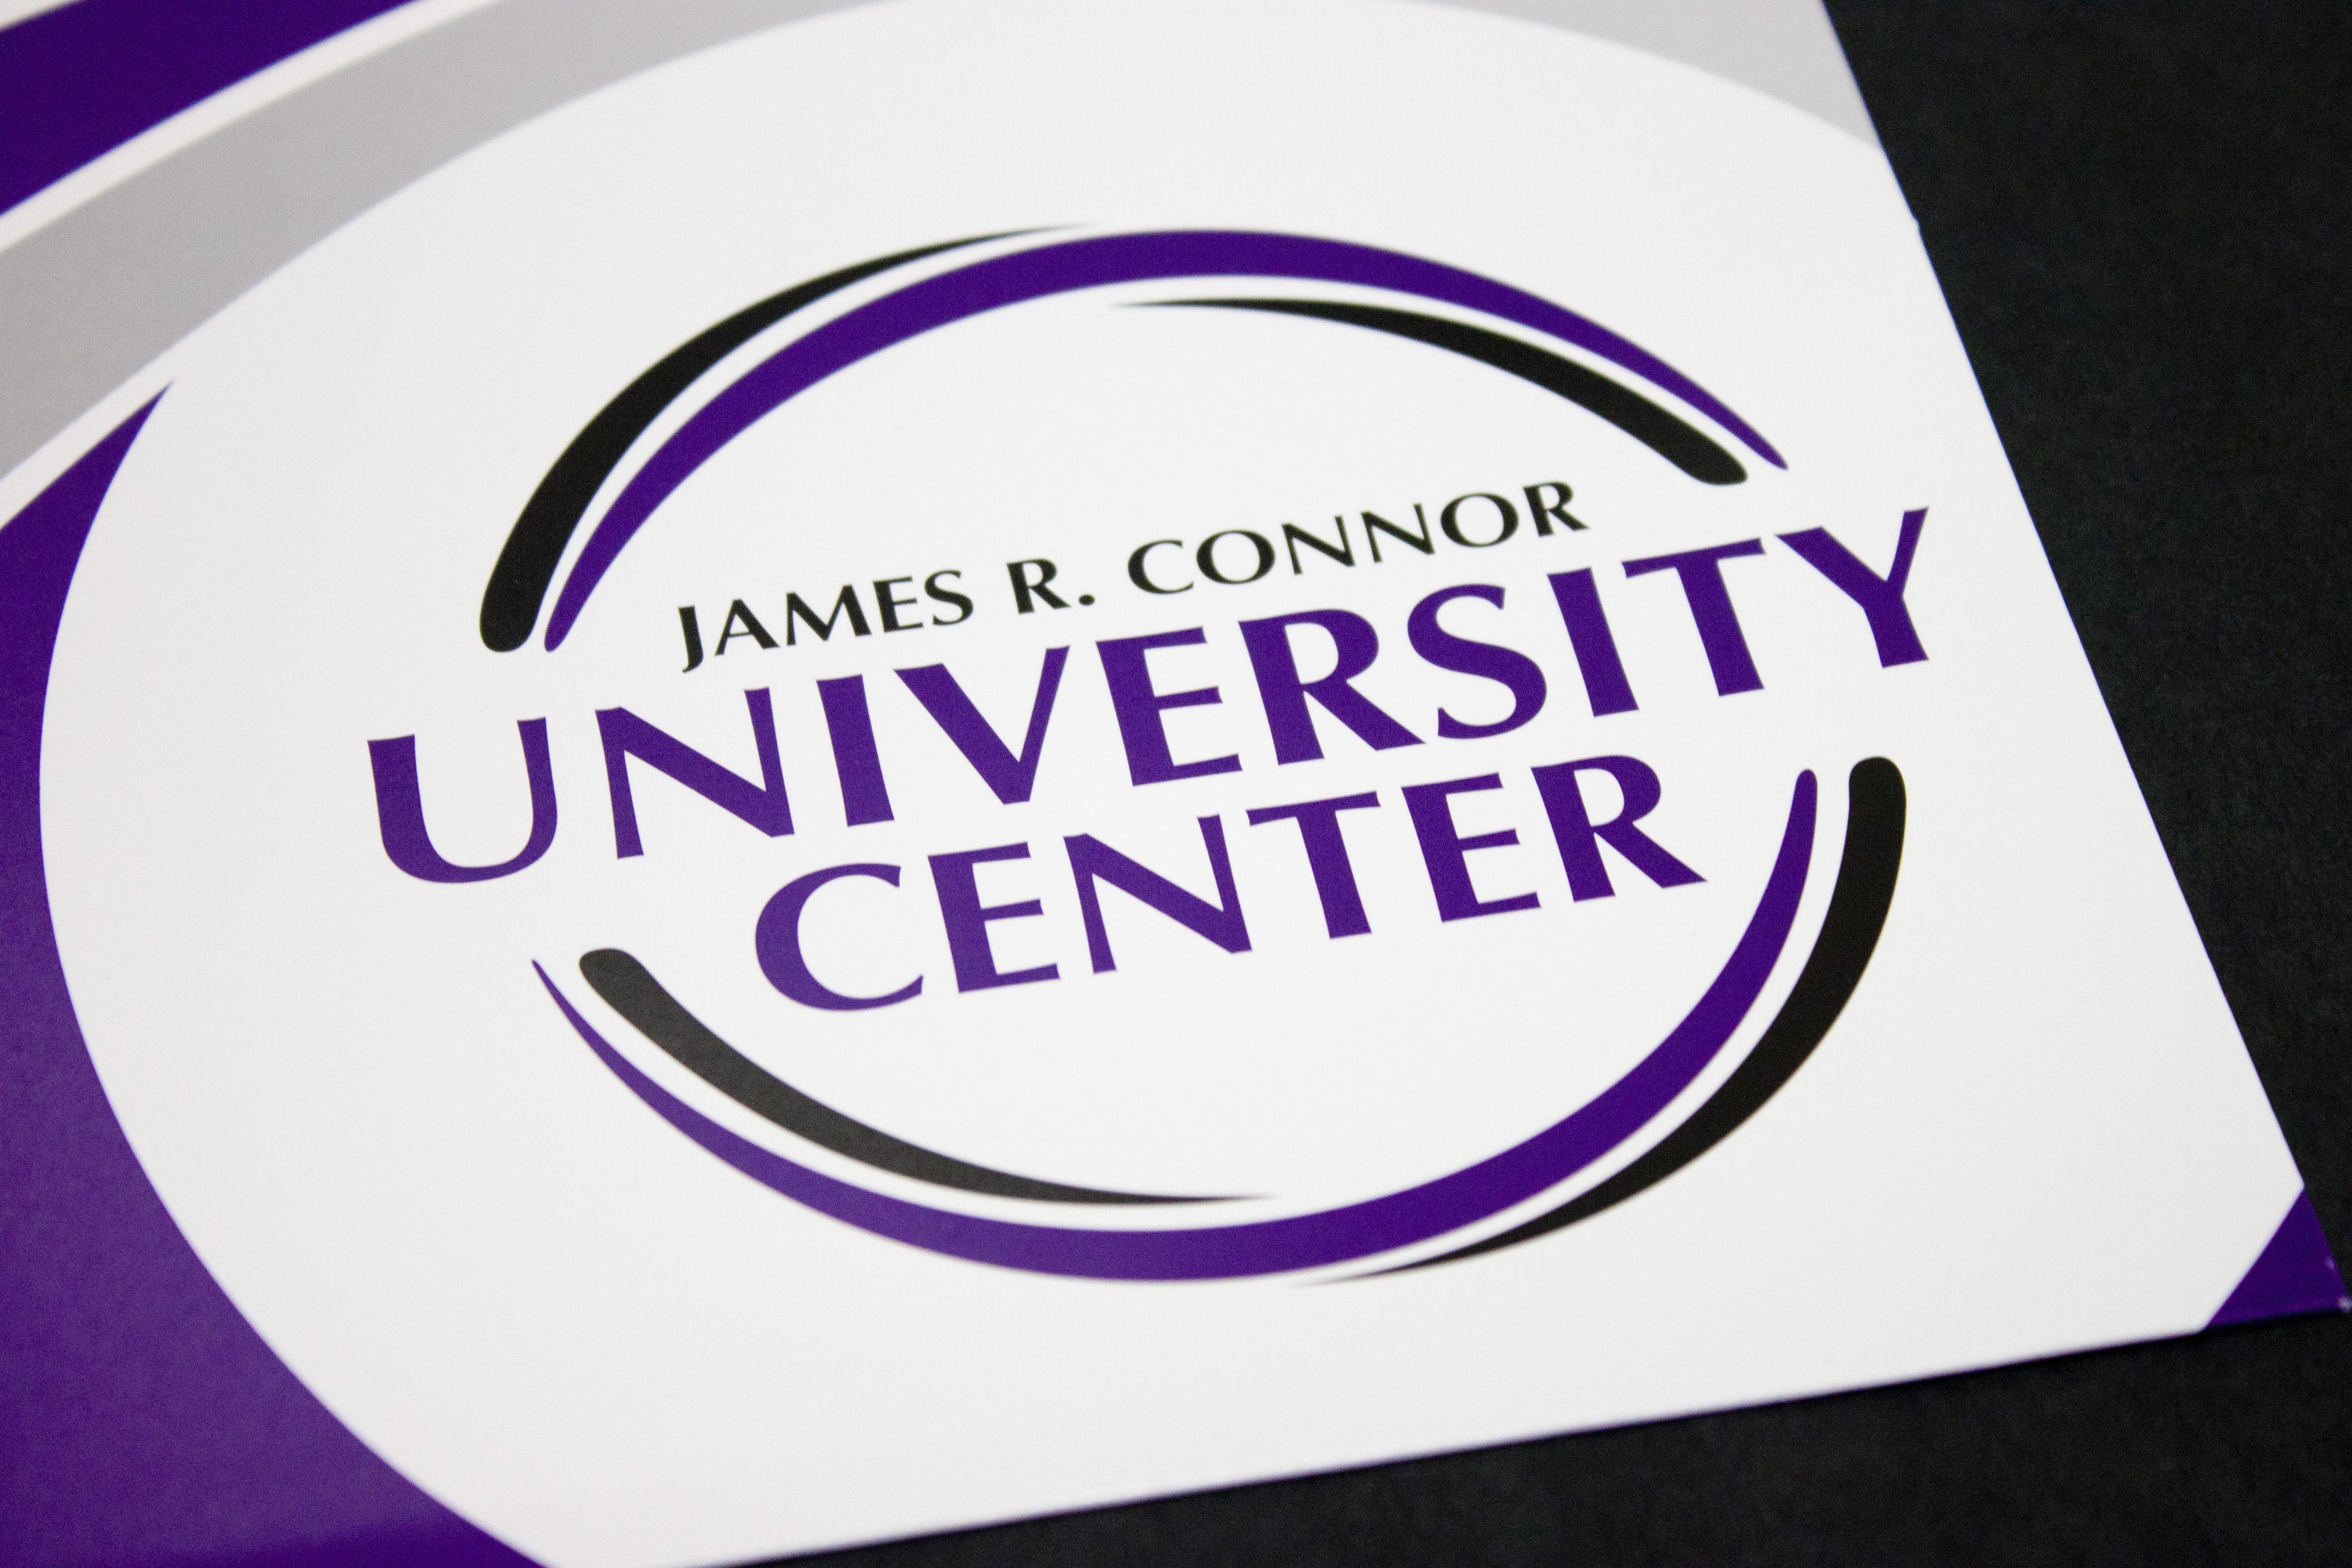 University Center Logo & Brand Identity Materials